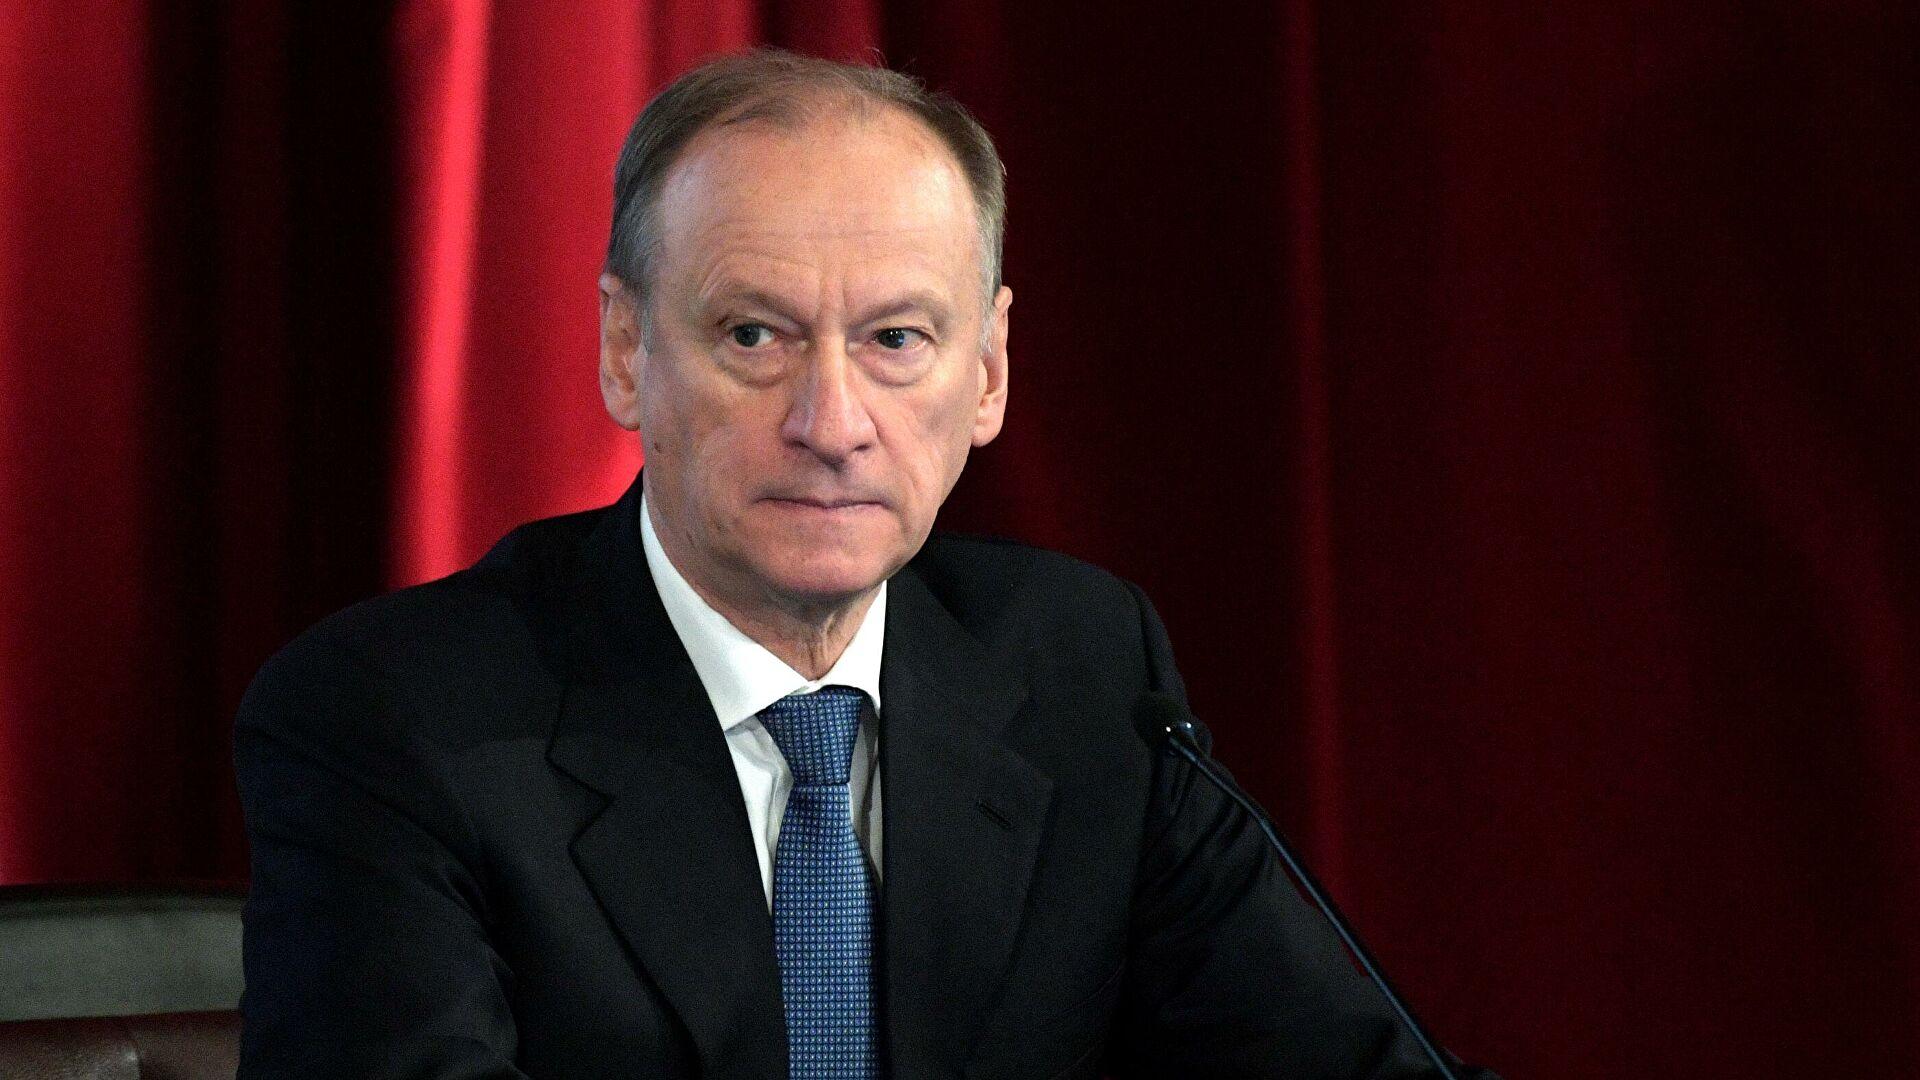 Patrušev i Vulin razgovarali o nastavku saradnje dve zemlje u oblasti unutrašnjih poslova